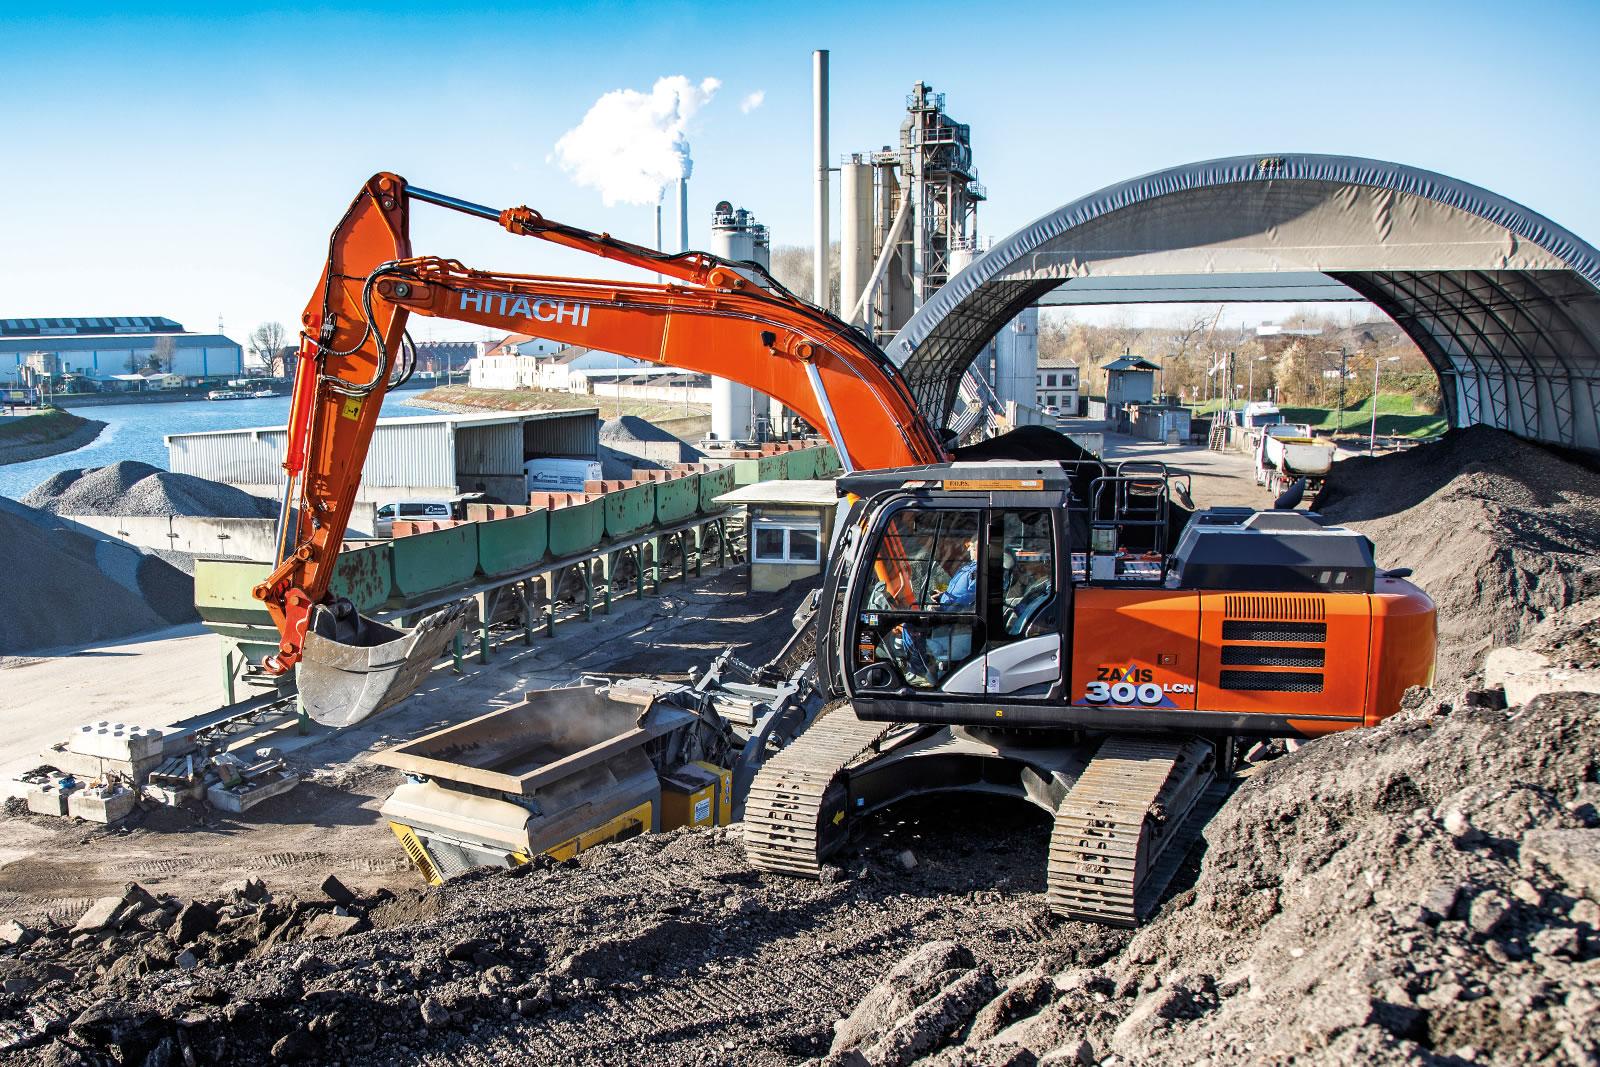 Hitachi ZX300LCN-6 excavator loads asphalt on to a mobile crusher